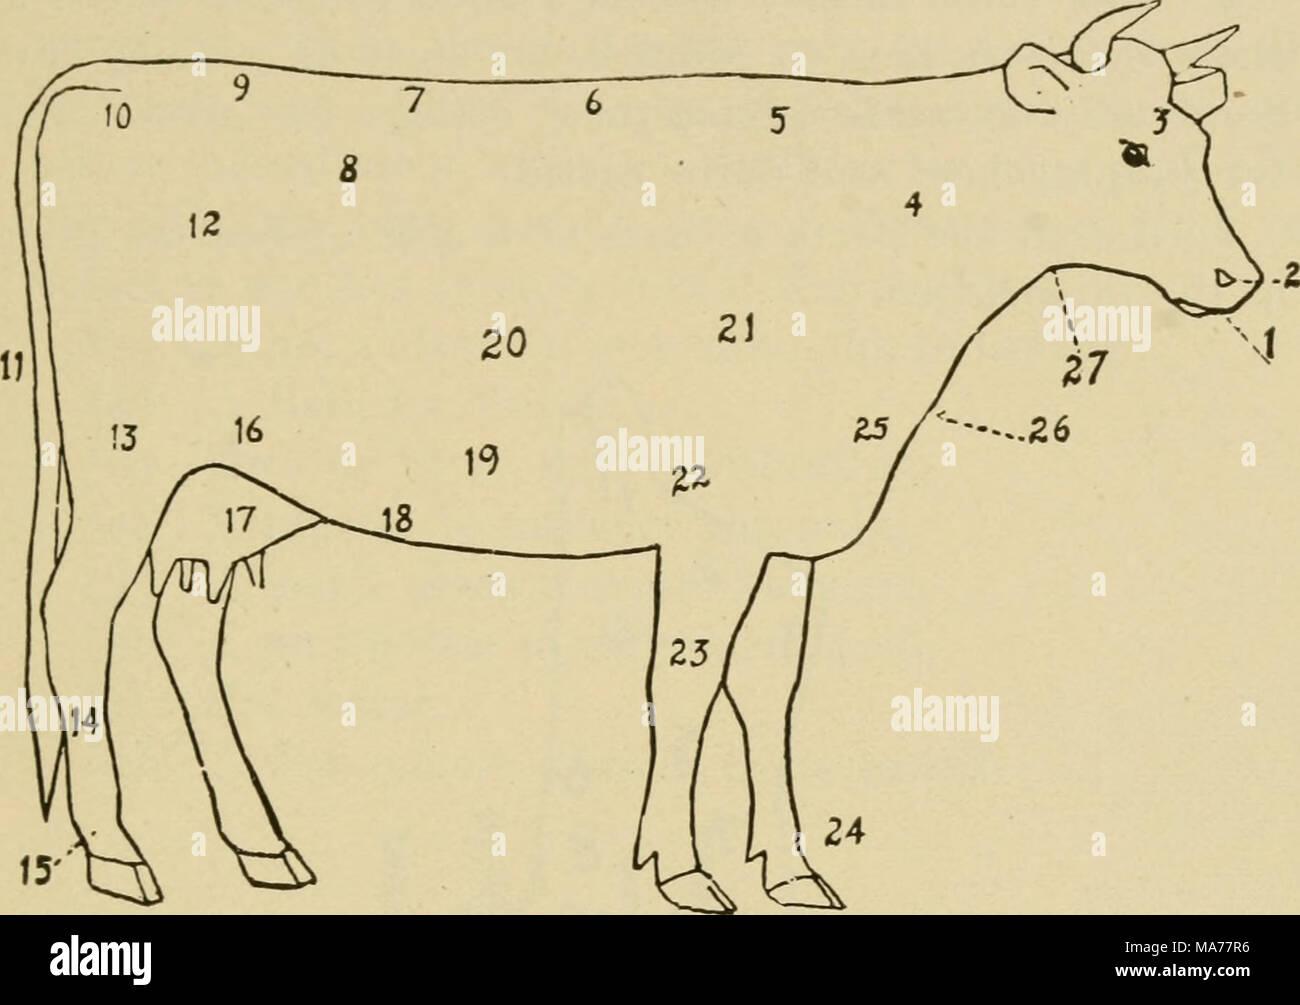 Diagram Of Cow Stockfotos & Diagram Of Cow Bilder - Alamy